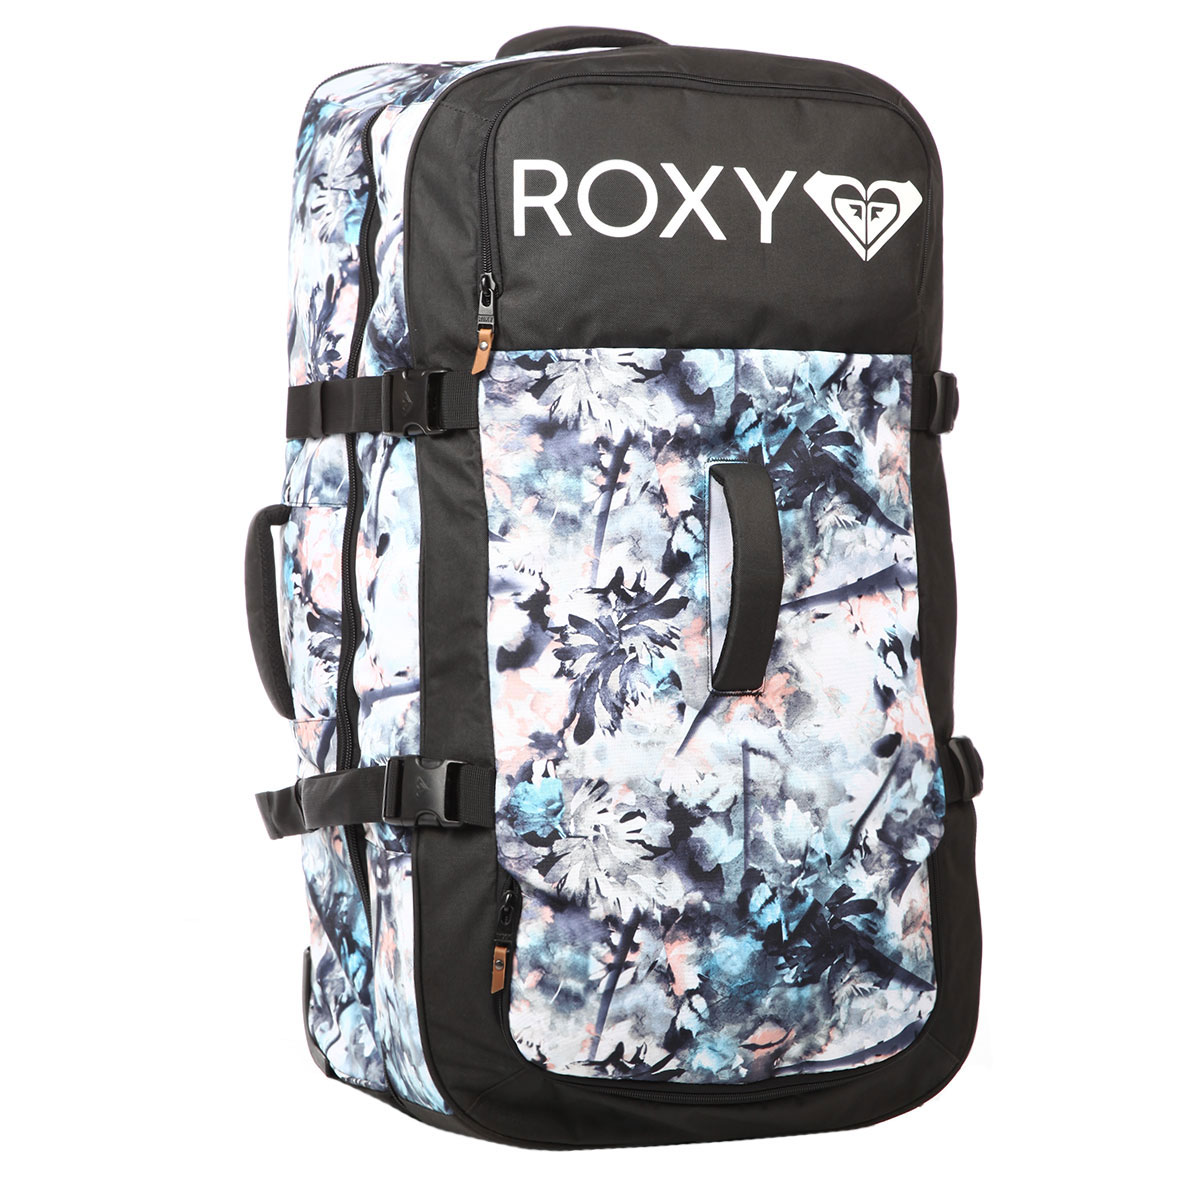 Купить сумку дорожная женскую Roxy Long Haul Bag Lugg Bachelor Button Wate  (ERJBL03119-BGZ1) в интернет-магазине Proskater.by 609f2d274d0